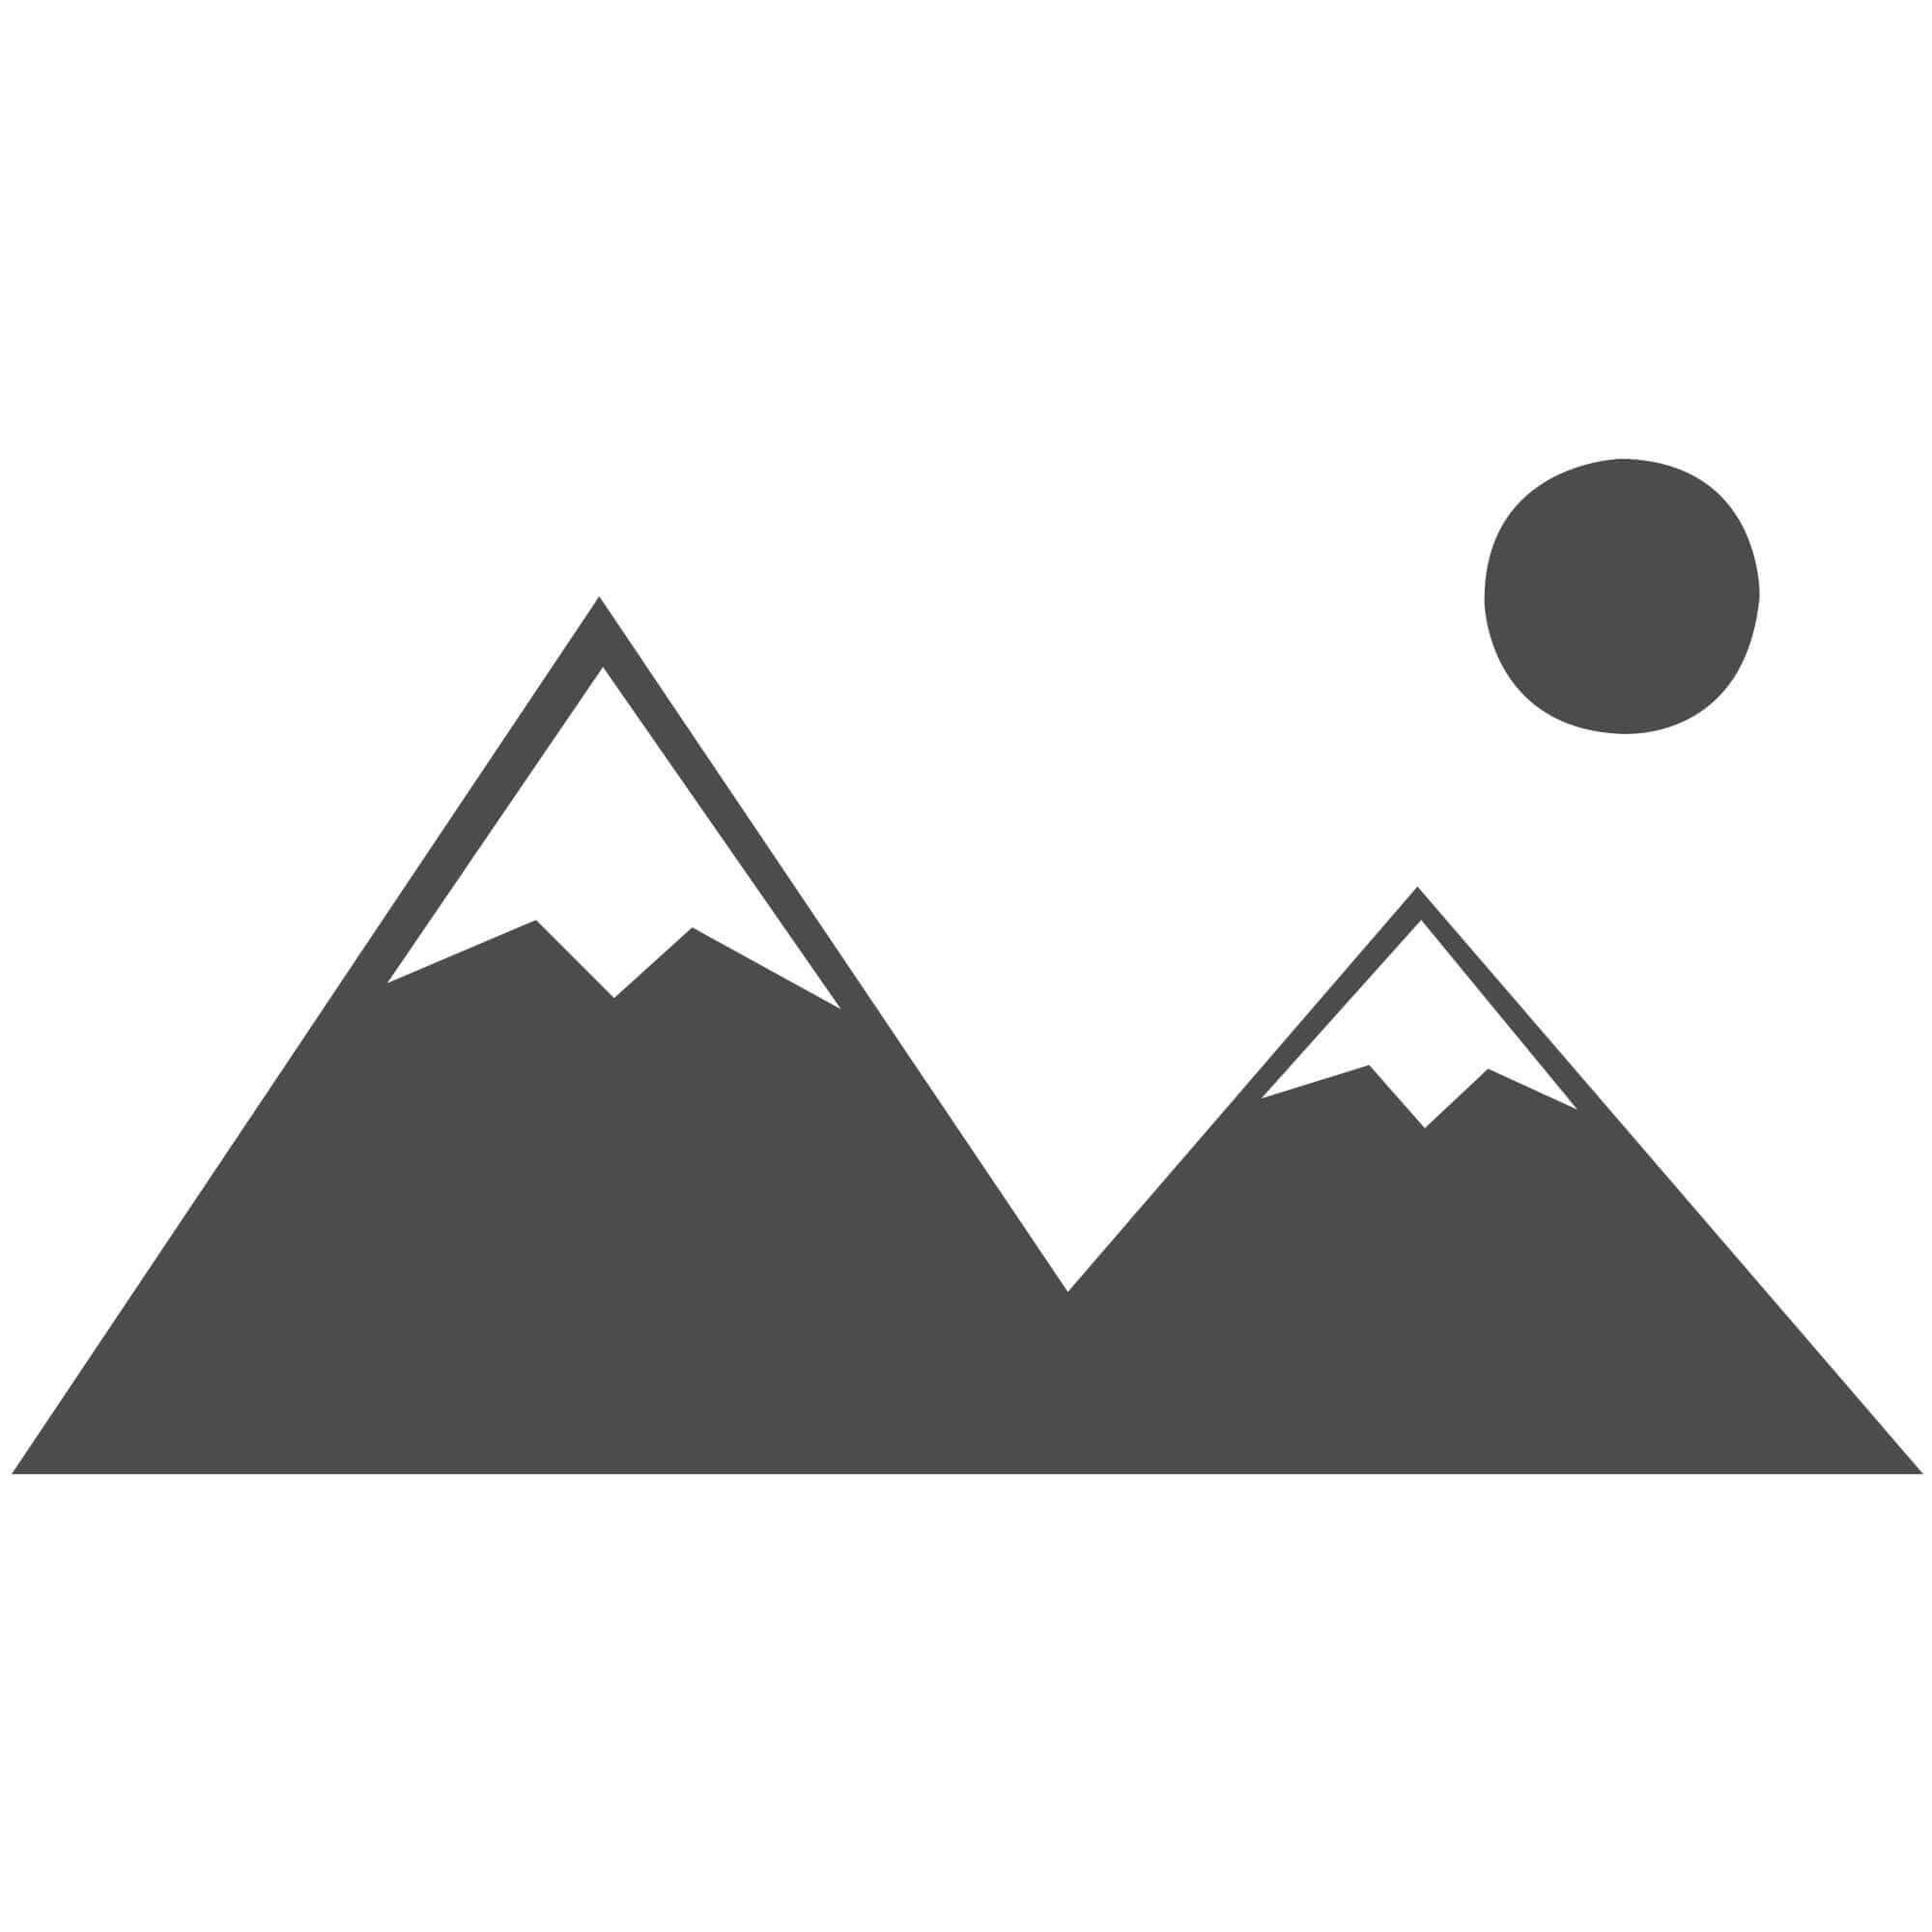 Nordpeis ME Pedestal wood burning stove #FPW